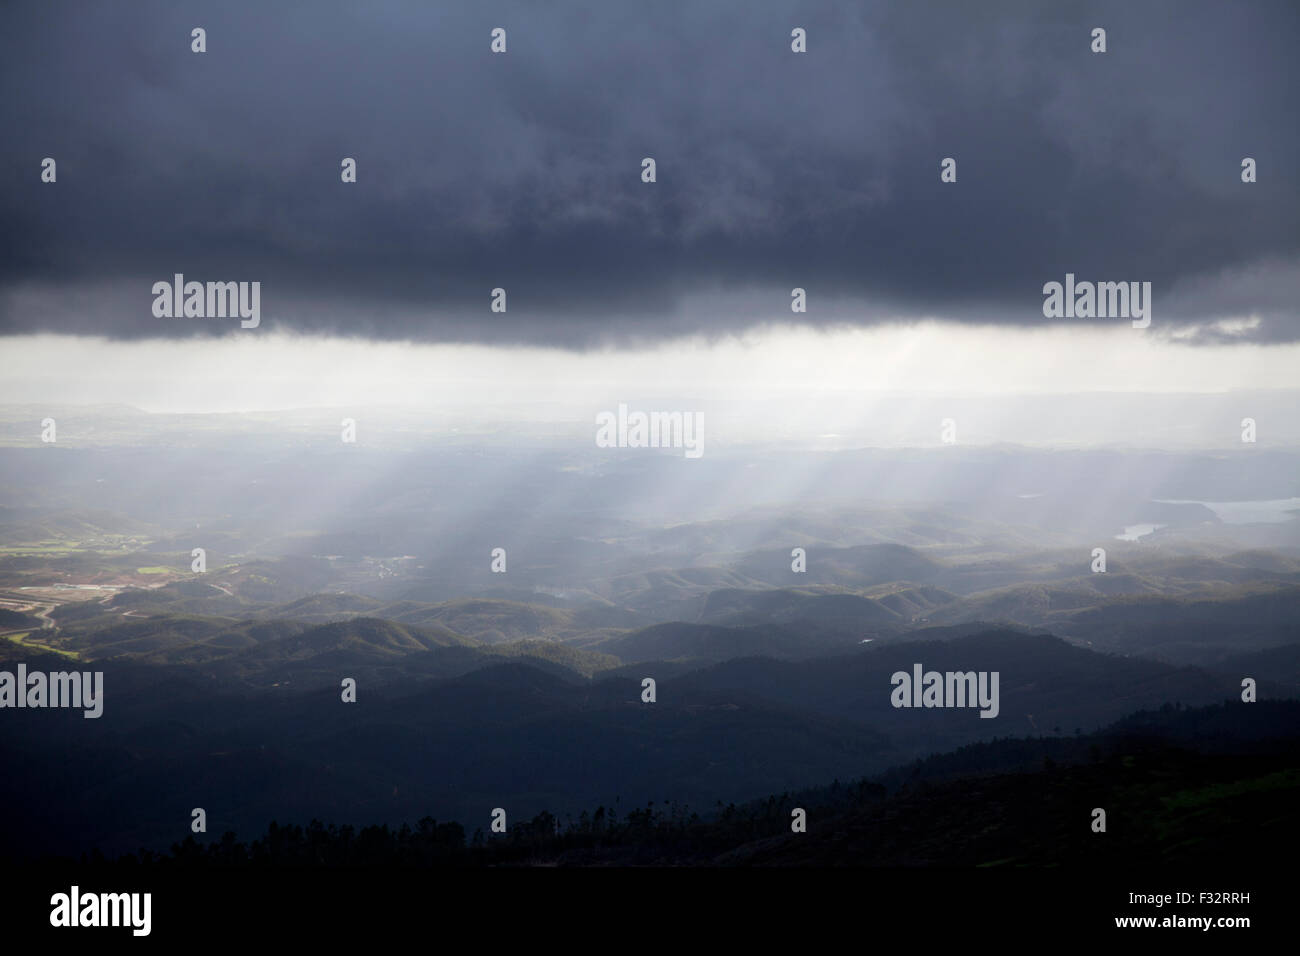 Dramatic landscape, Algarve countryside, Portugal. - Stock Image